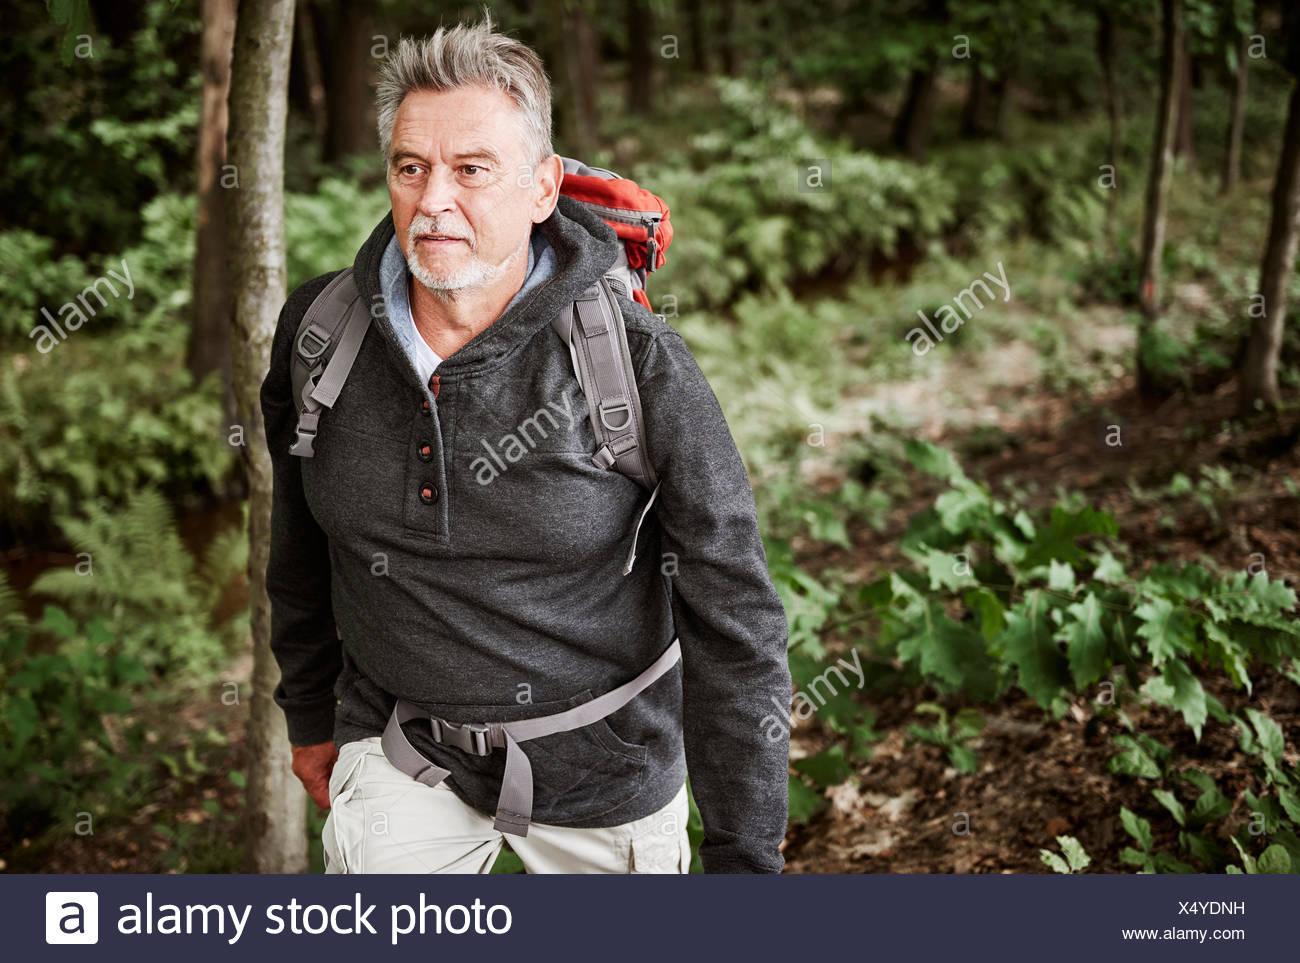 Senior man hiking through forest - Stock Image